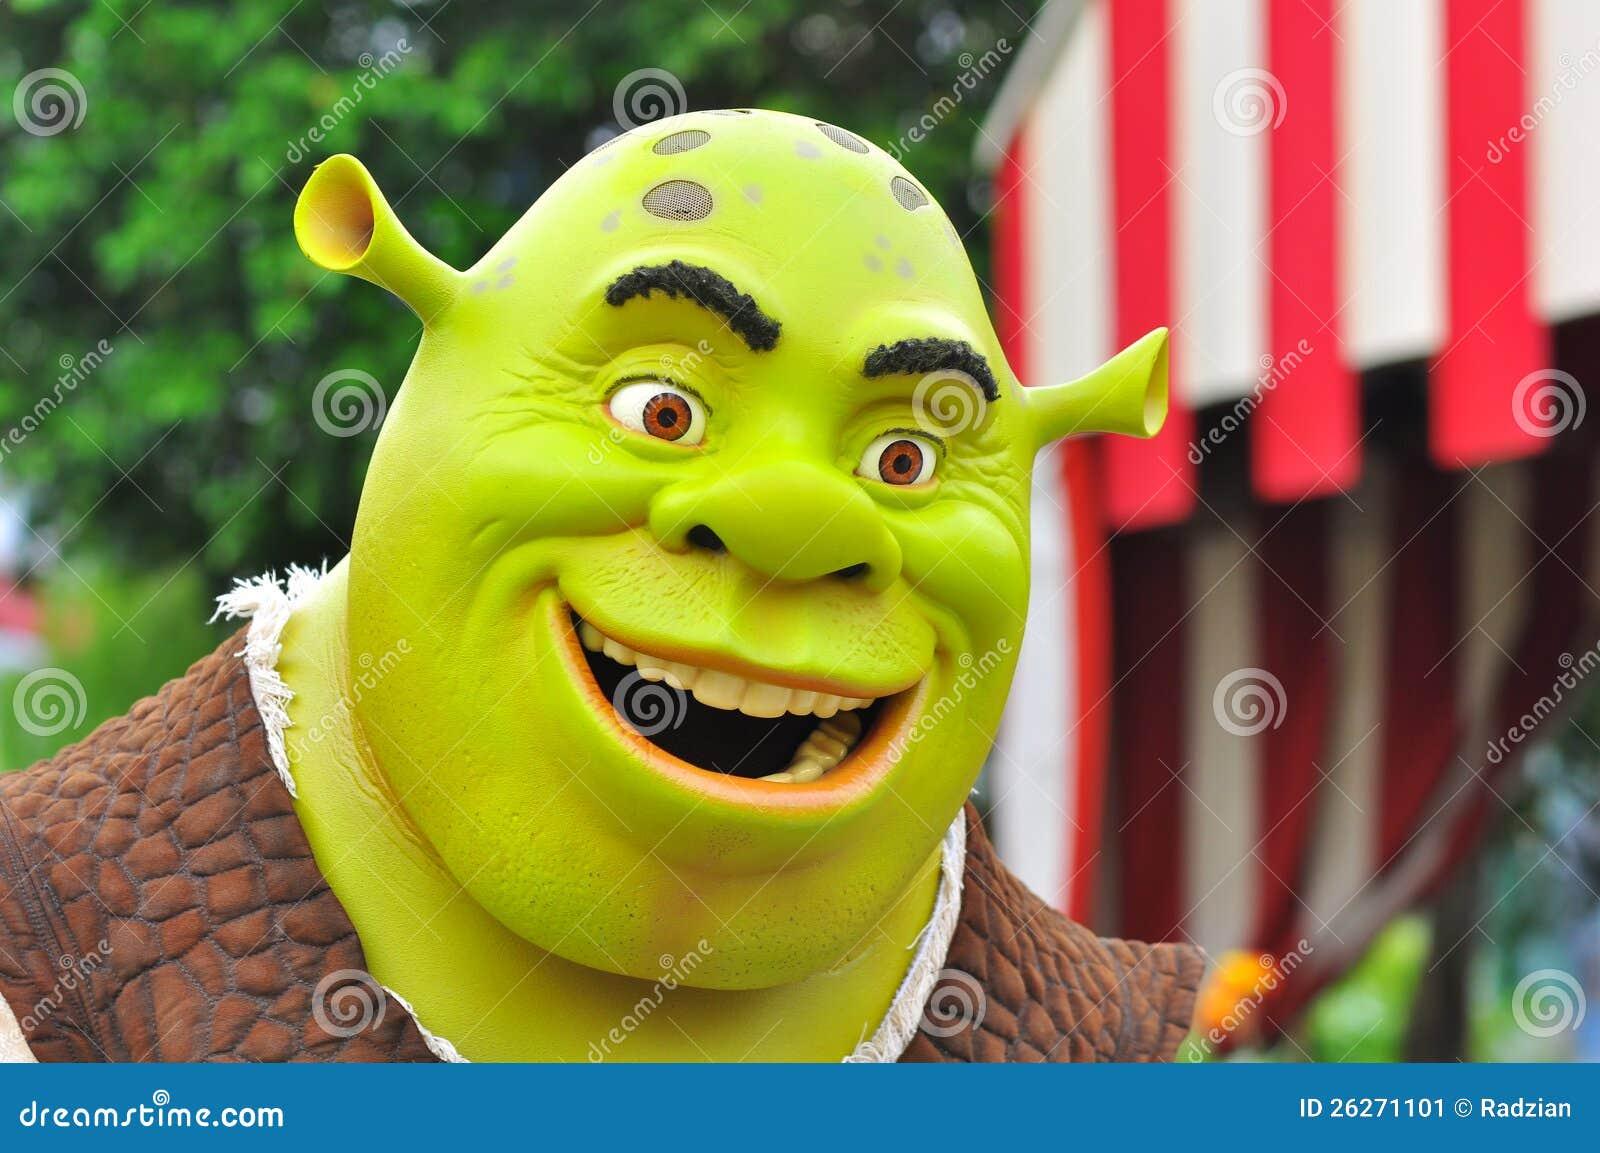 Shrek Cartoon Character Editorial Photo - Image: 26271101 Bruce Willis Tower